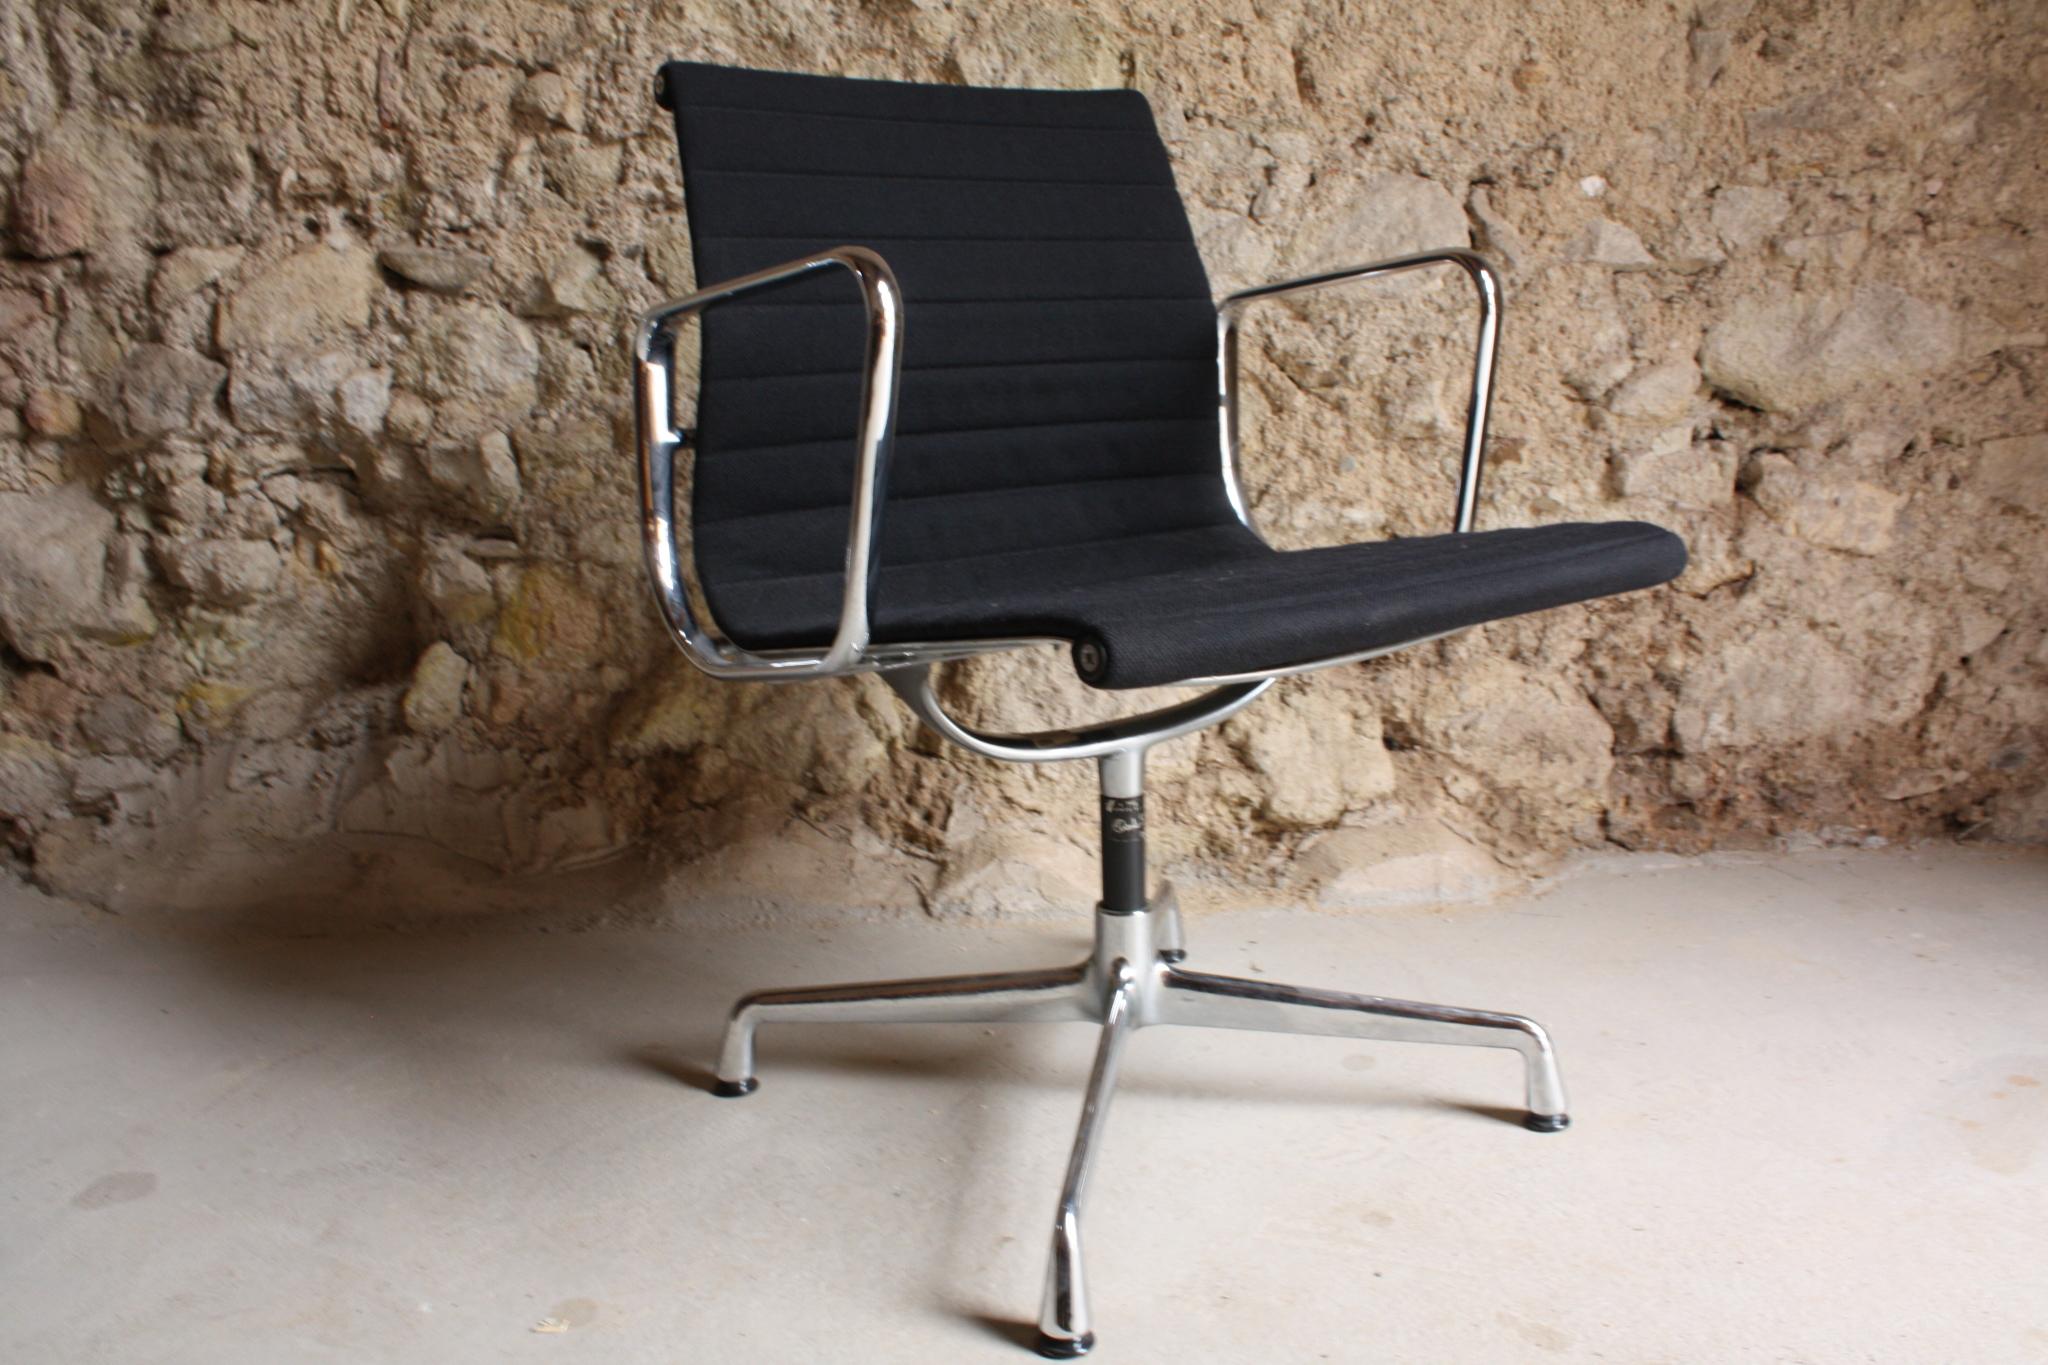 eames herman miller vitra aluminium chair ea 108 1 v 1 design ikonen. Black Bedroom Furniture Sets. Home Design Ideas